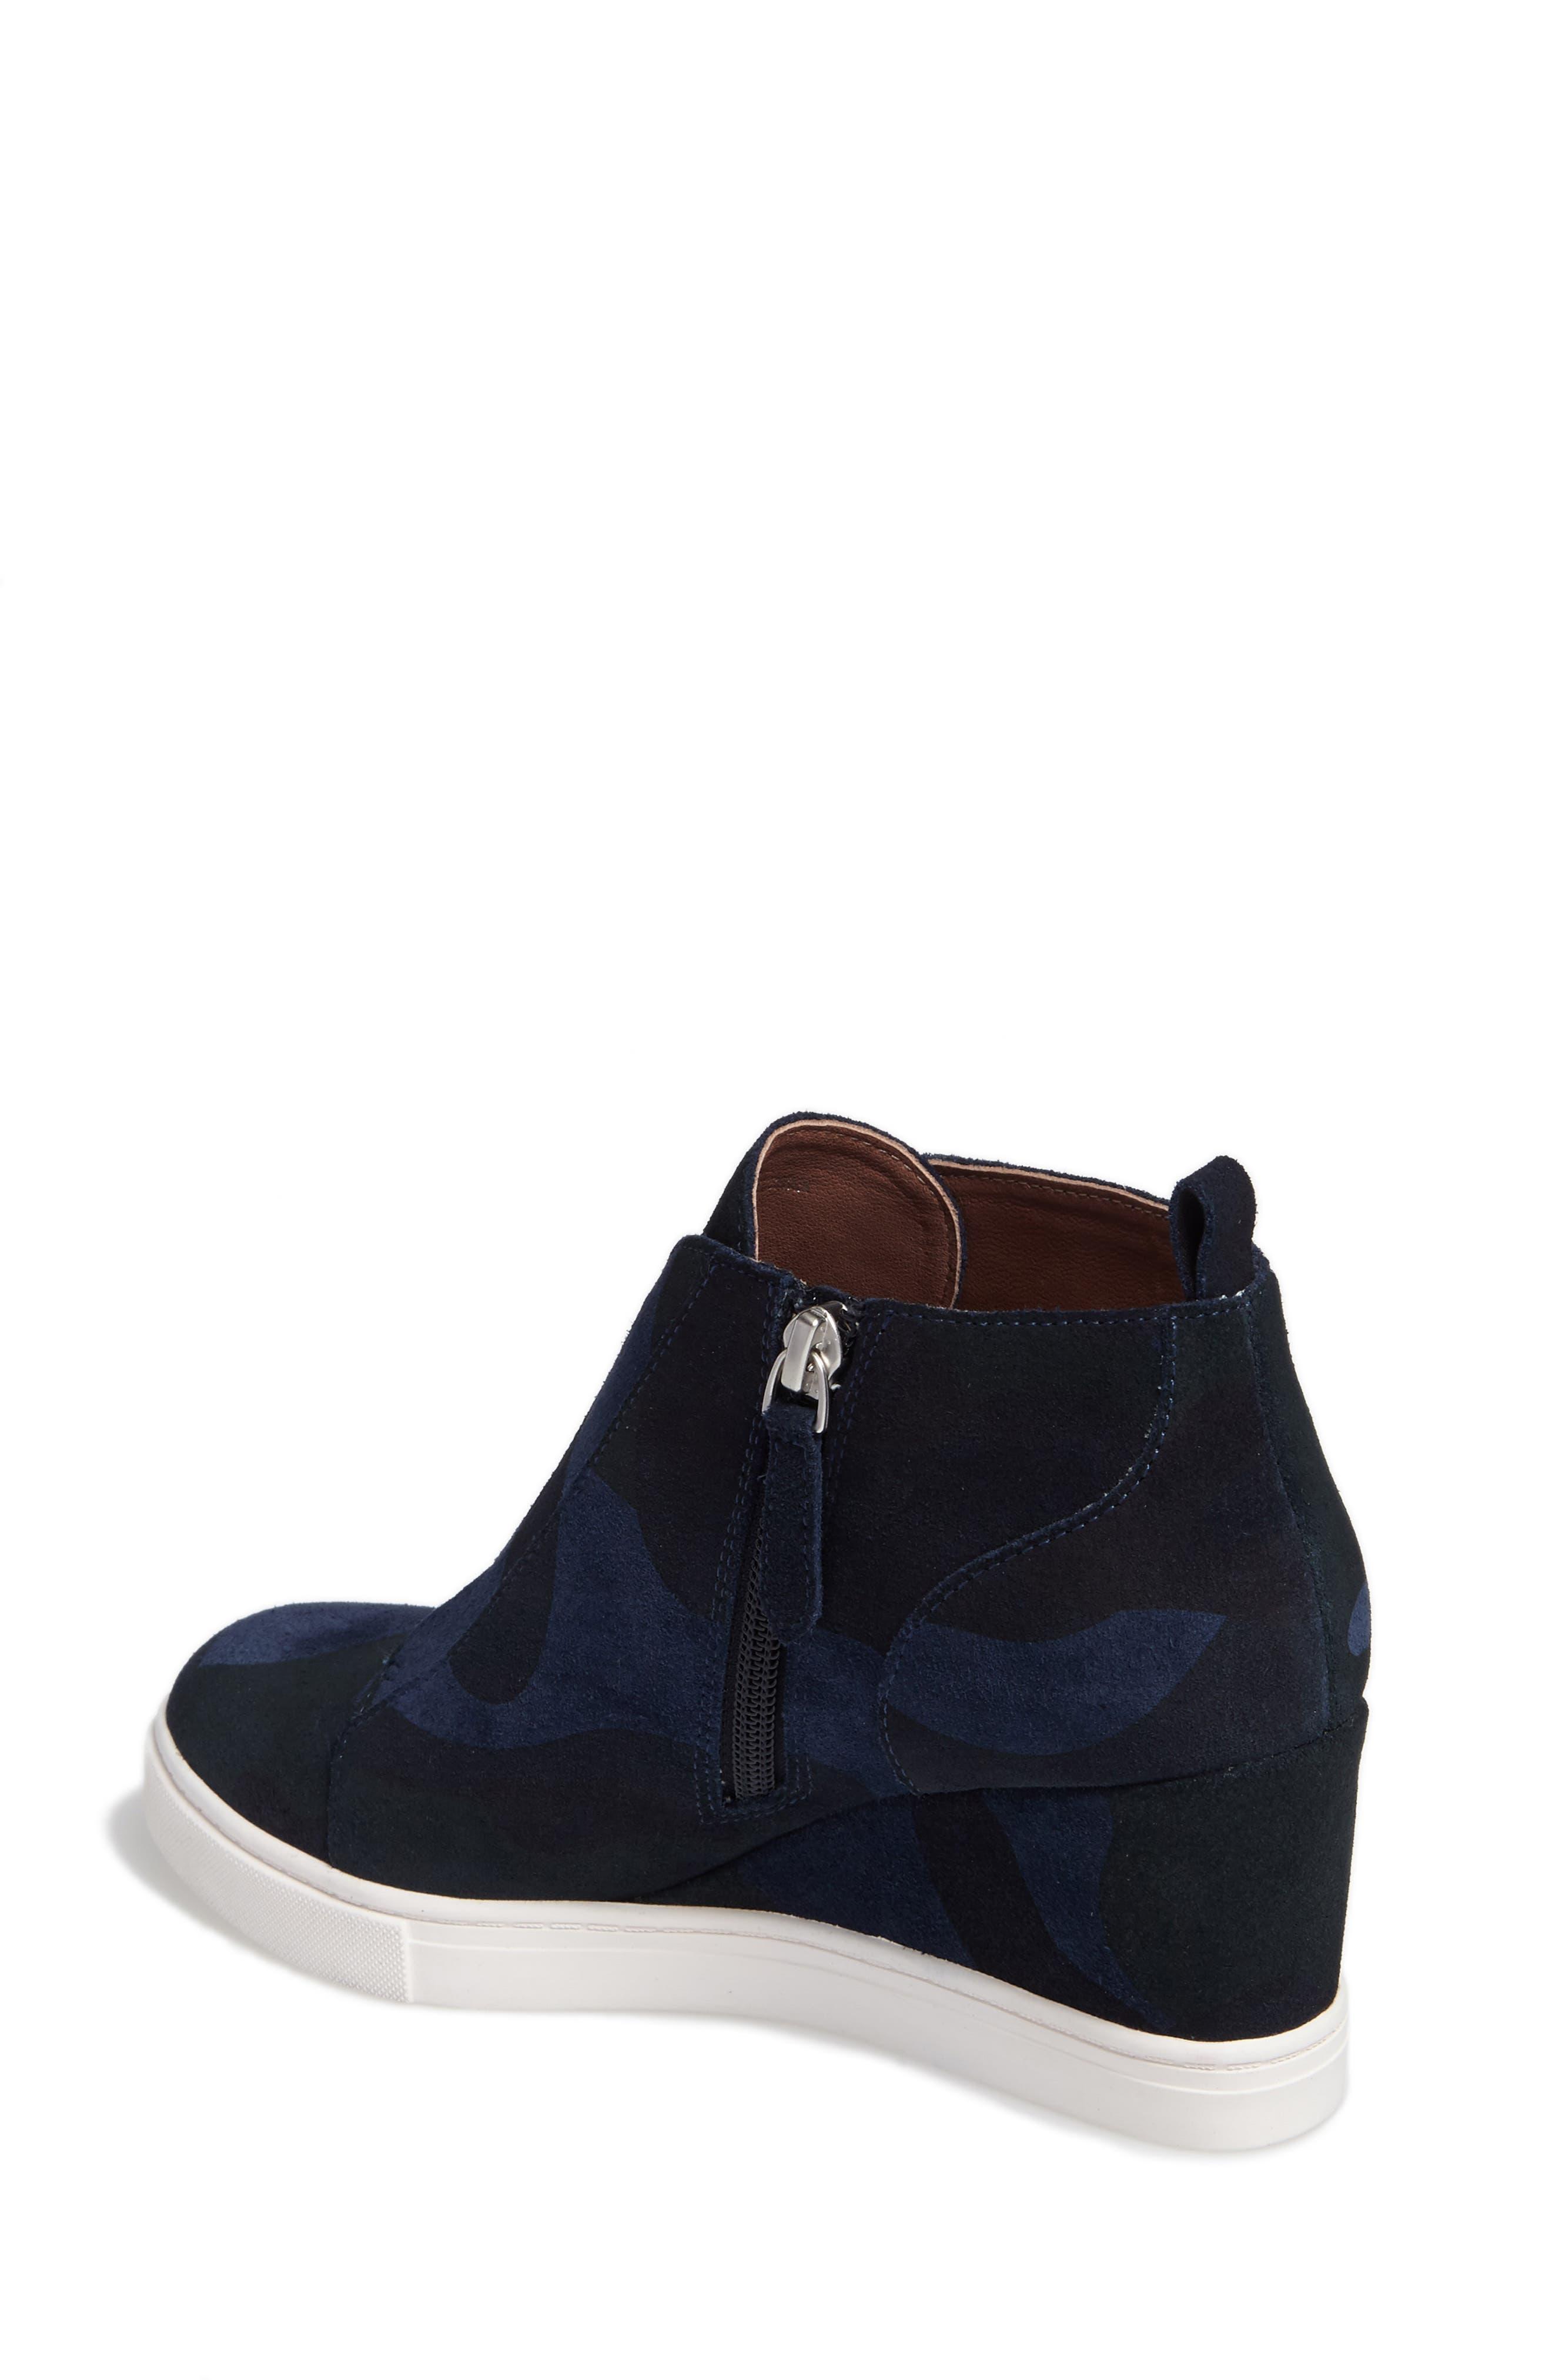 5f92105940bc Women s Boots Sale